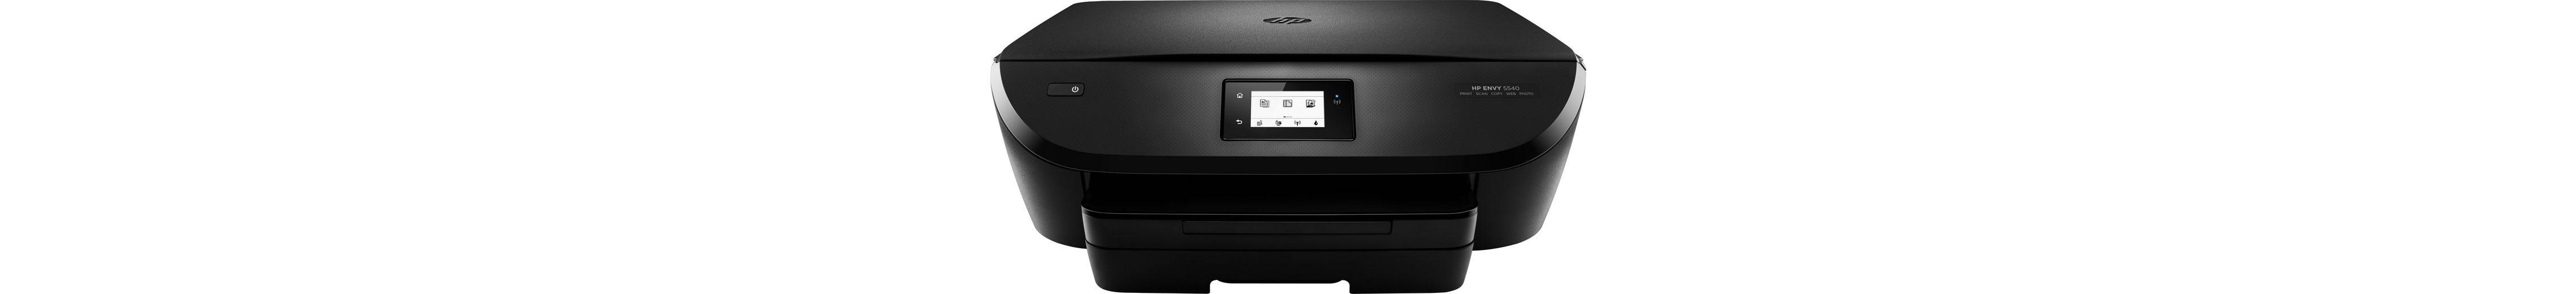 HP Envy 5540 Multifunktionsdrucker